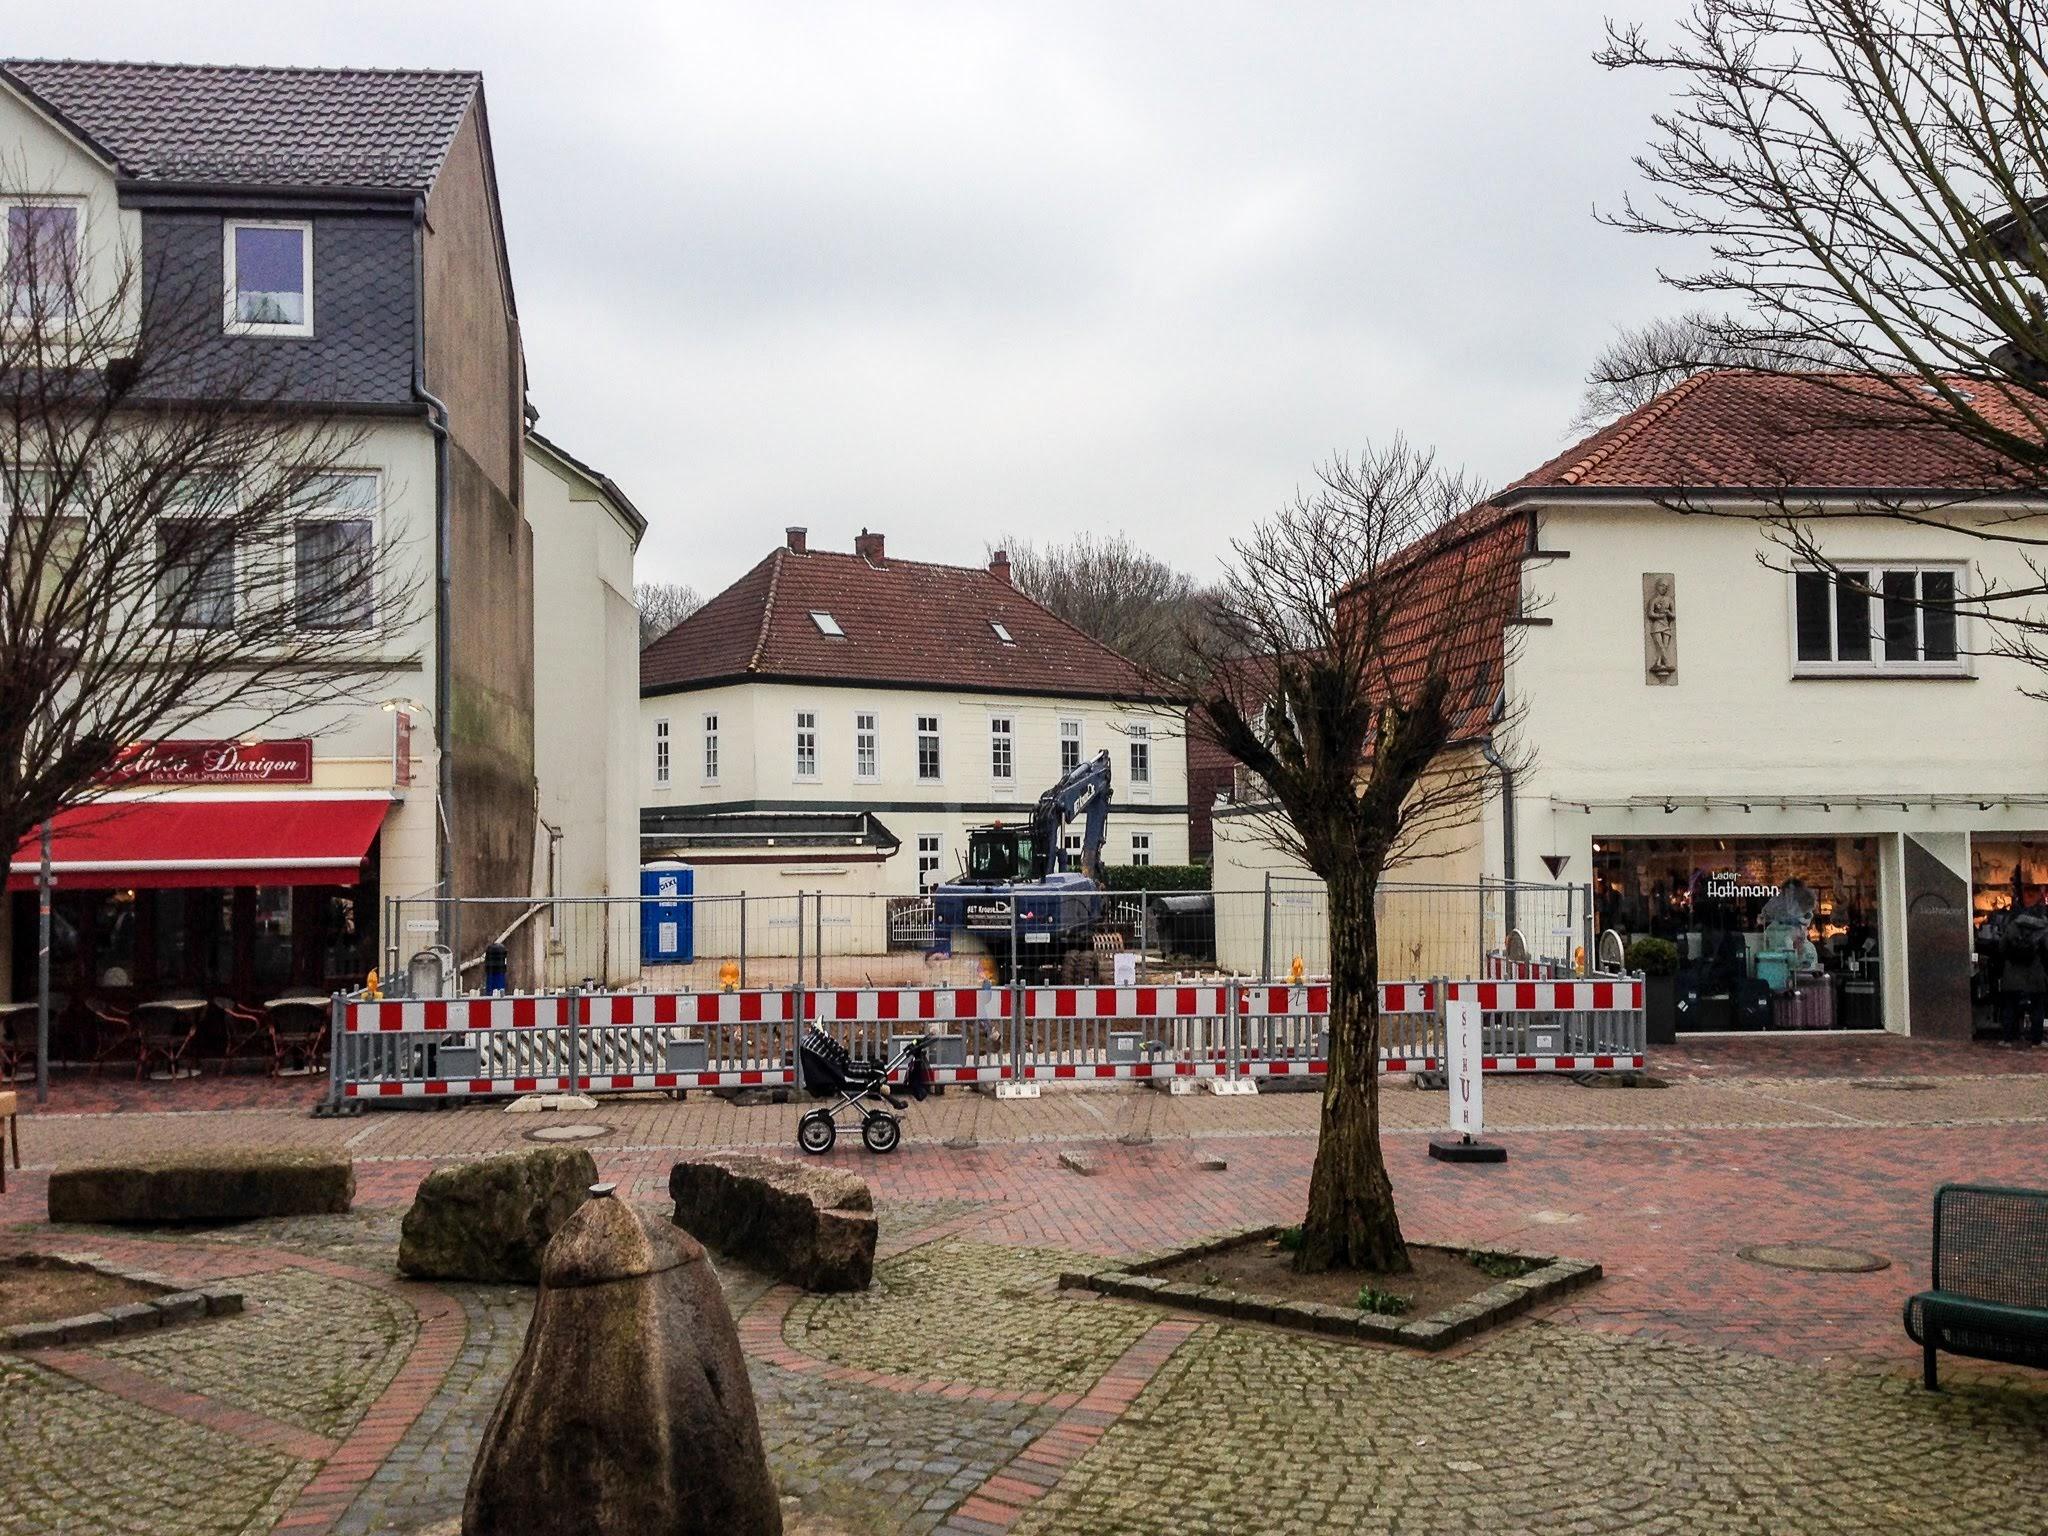 Kirchenstraße 16 in Osterholz-Scharmbeck